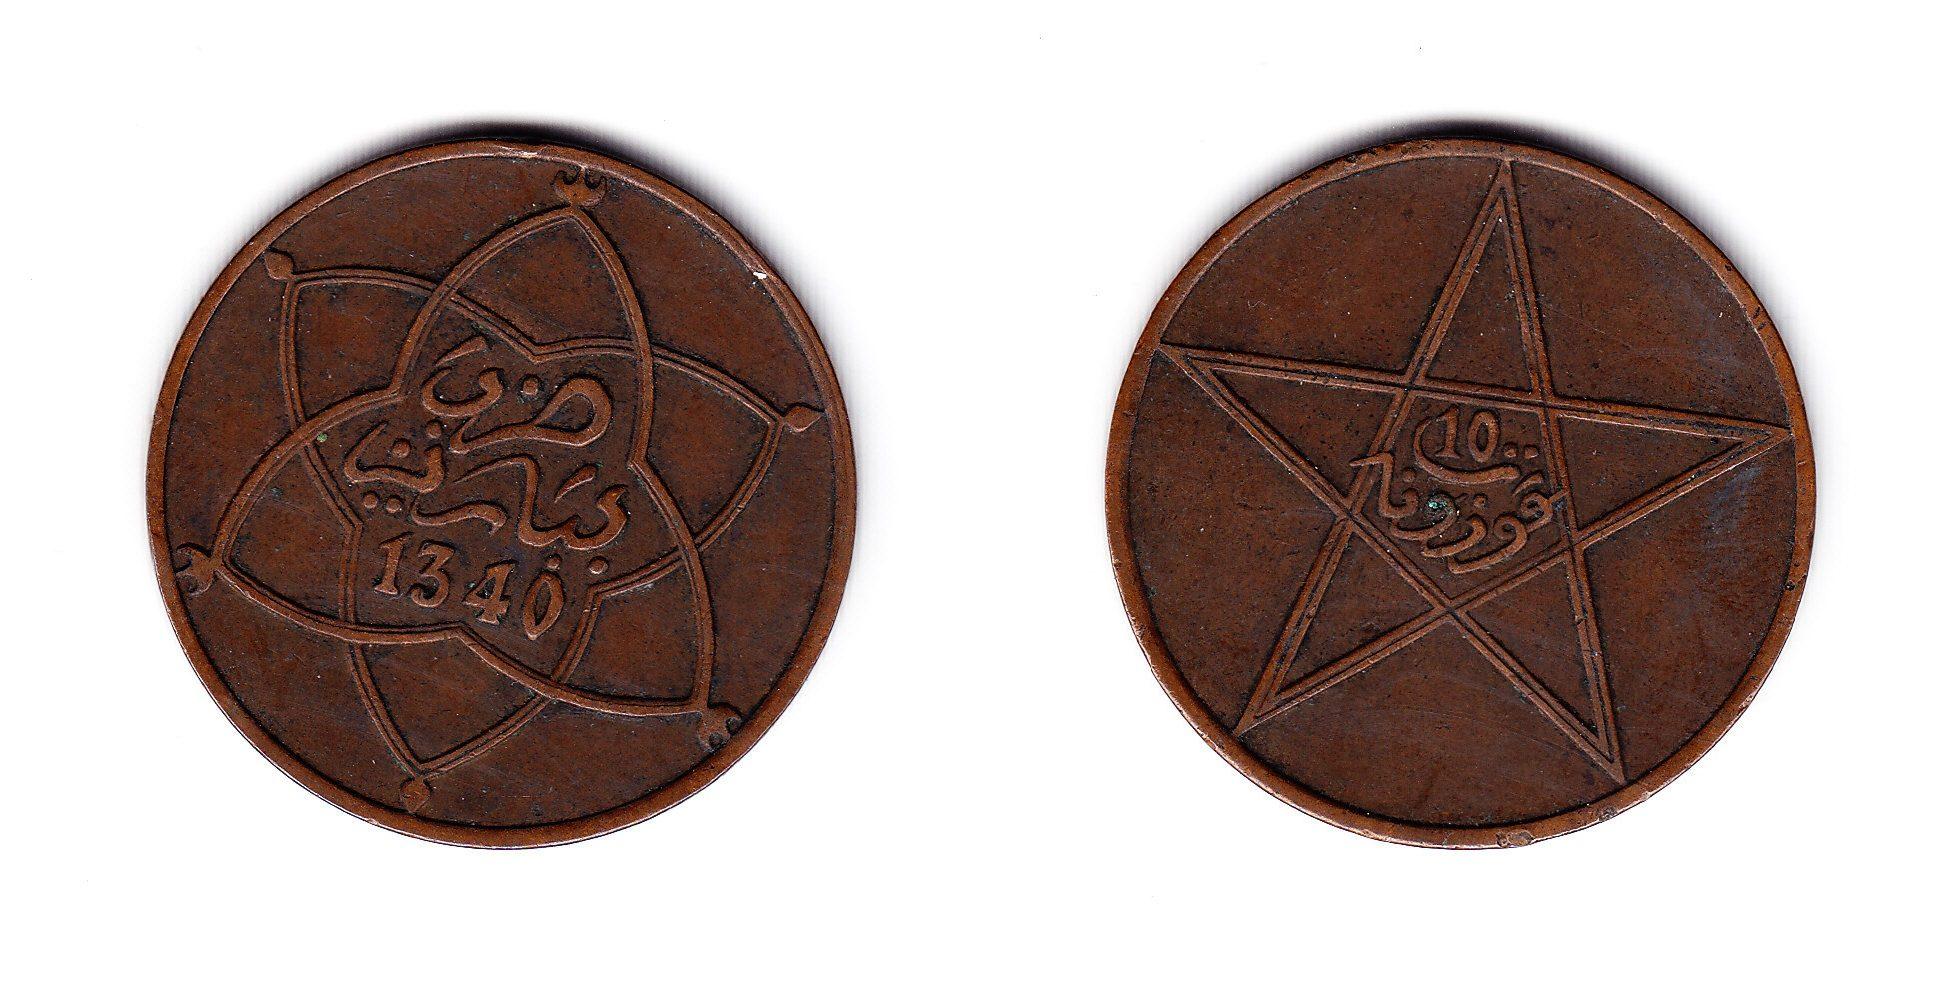 Marokko 10 Mazunas 1340 ss